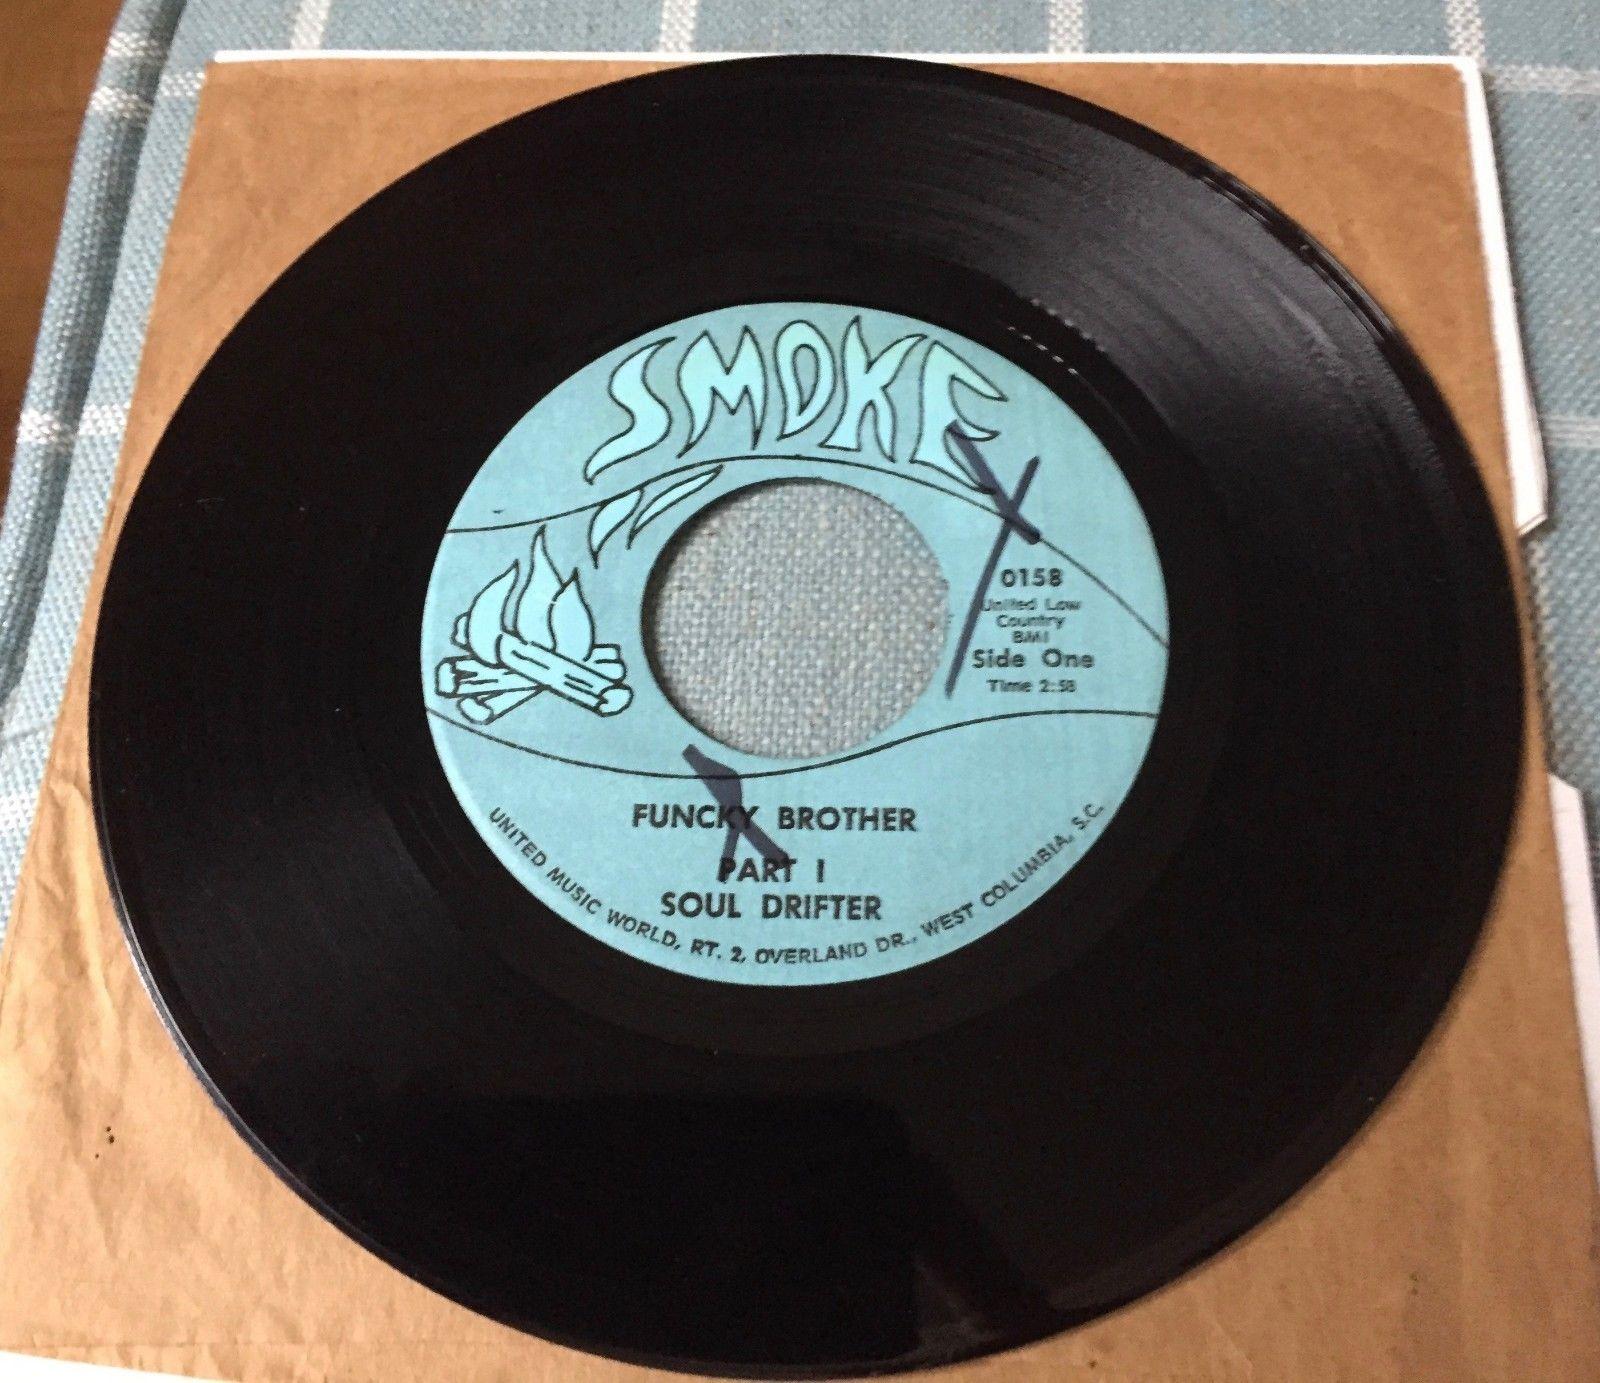 Very Rare Funk, 7'' Vinyl Original. SOUL DRIFTER, FUNCKY BROTHER Parts 1 & 2.